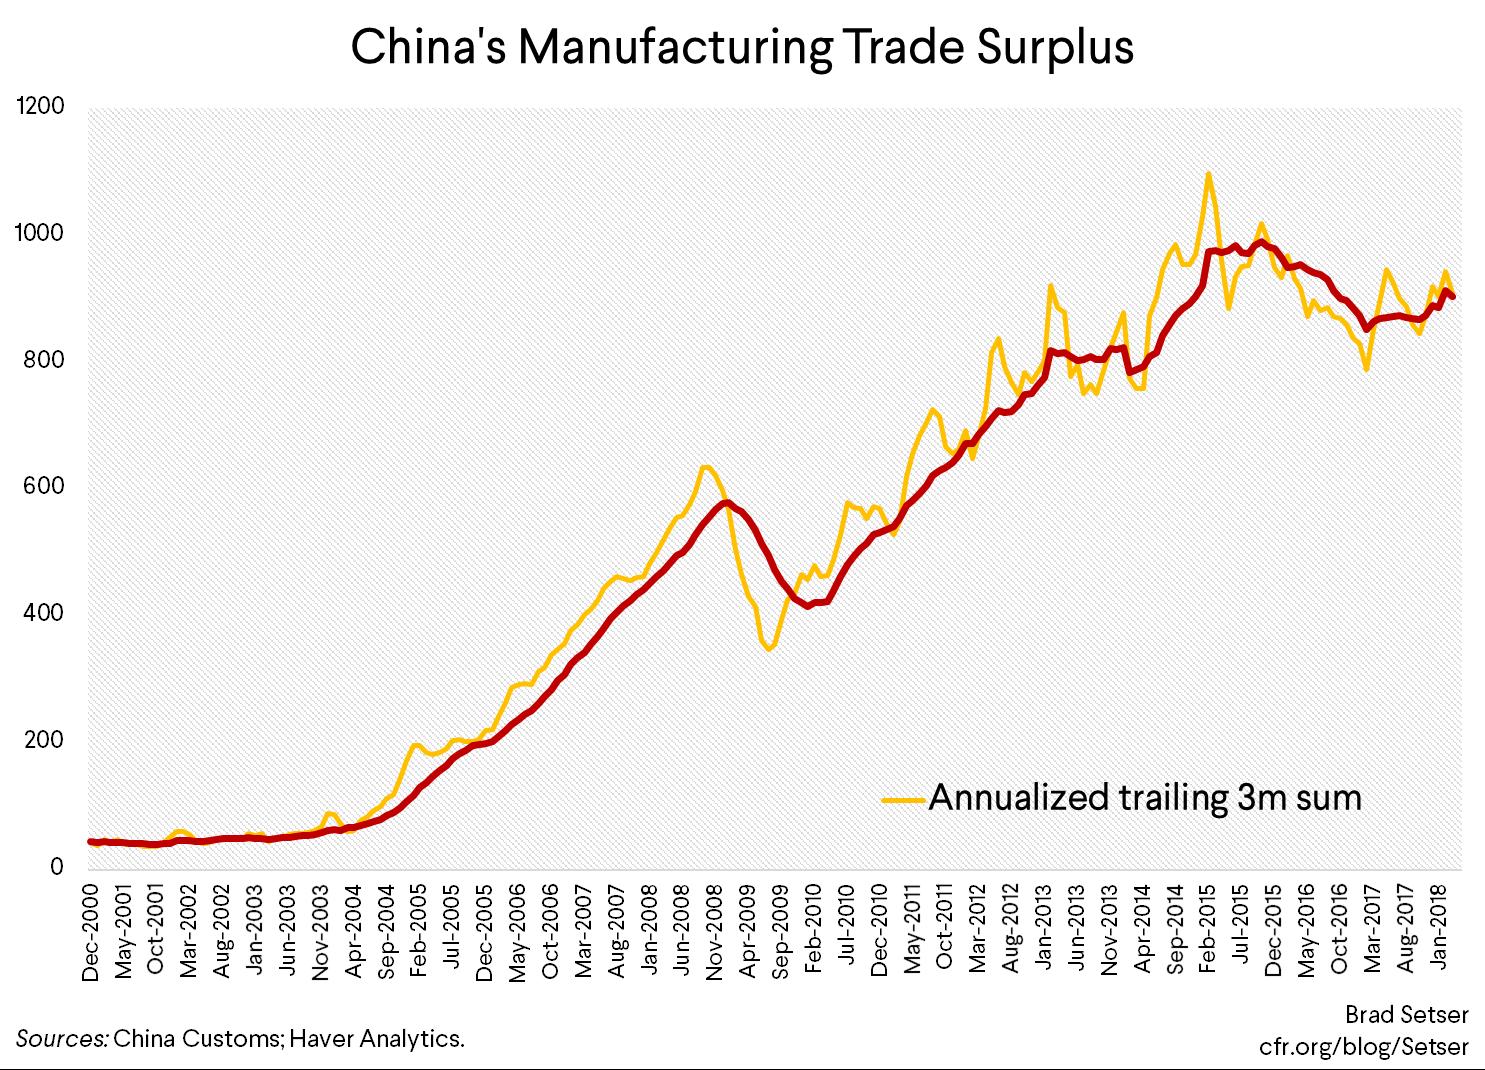 How Durable is China's Rebalancing?